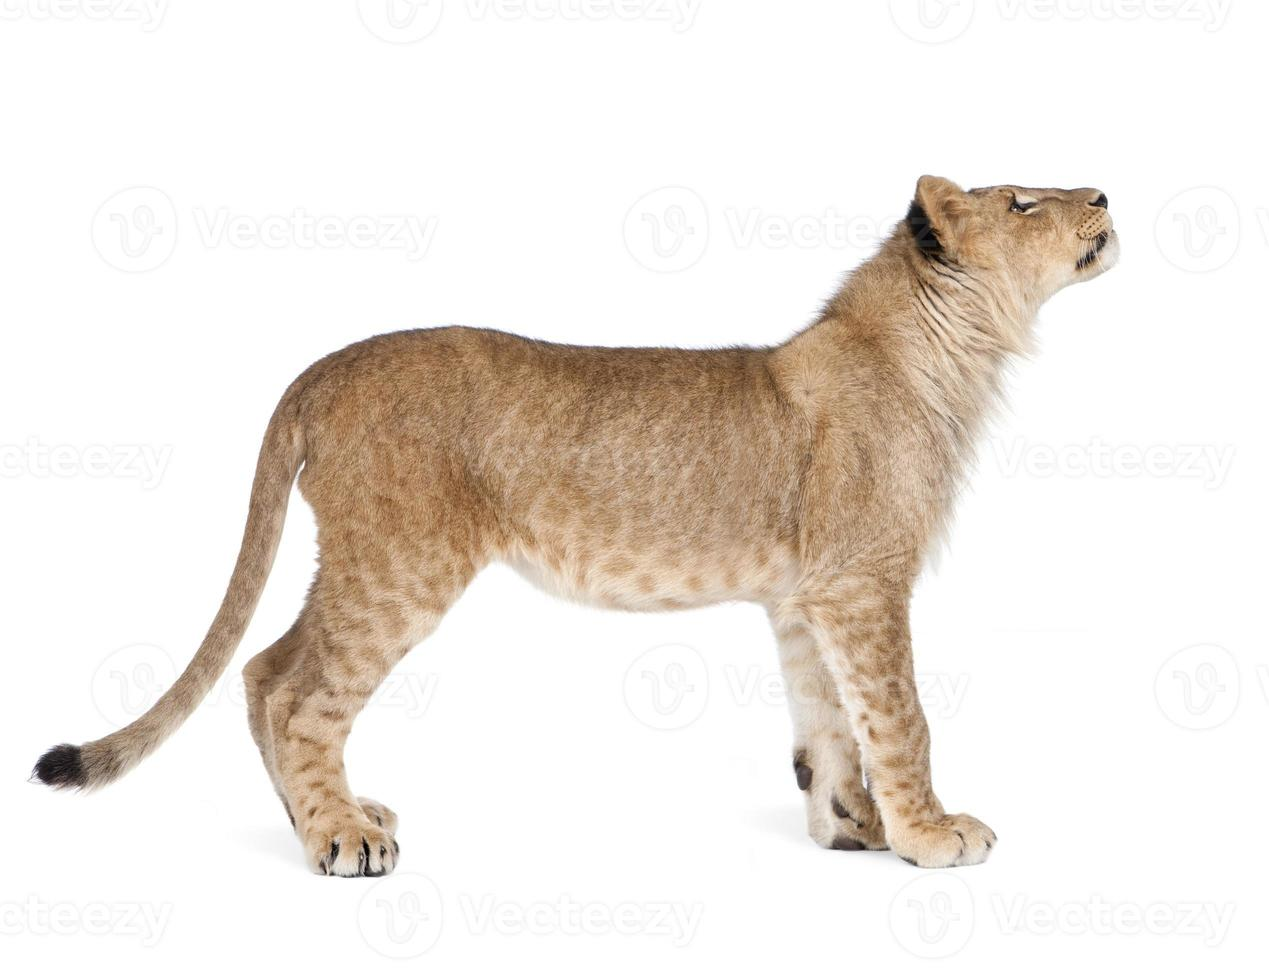 cachorro de león 8 meses foto